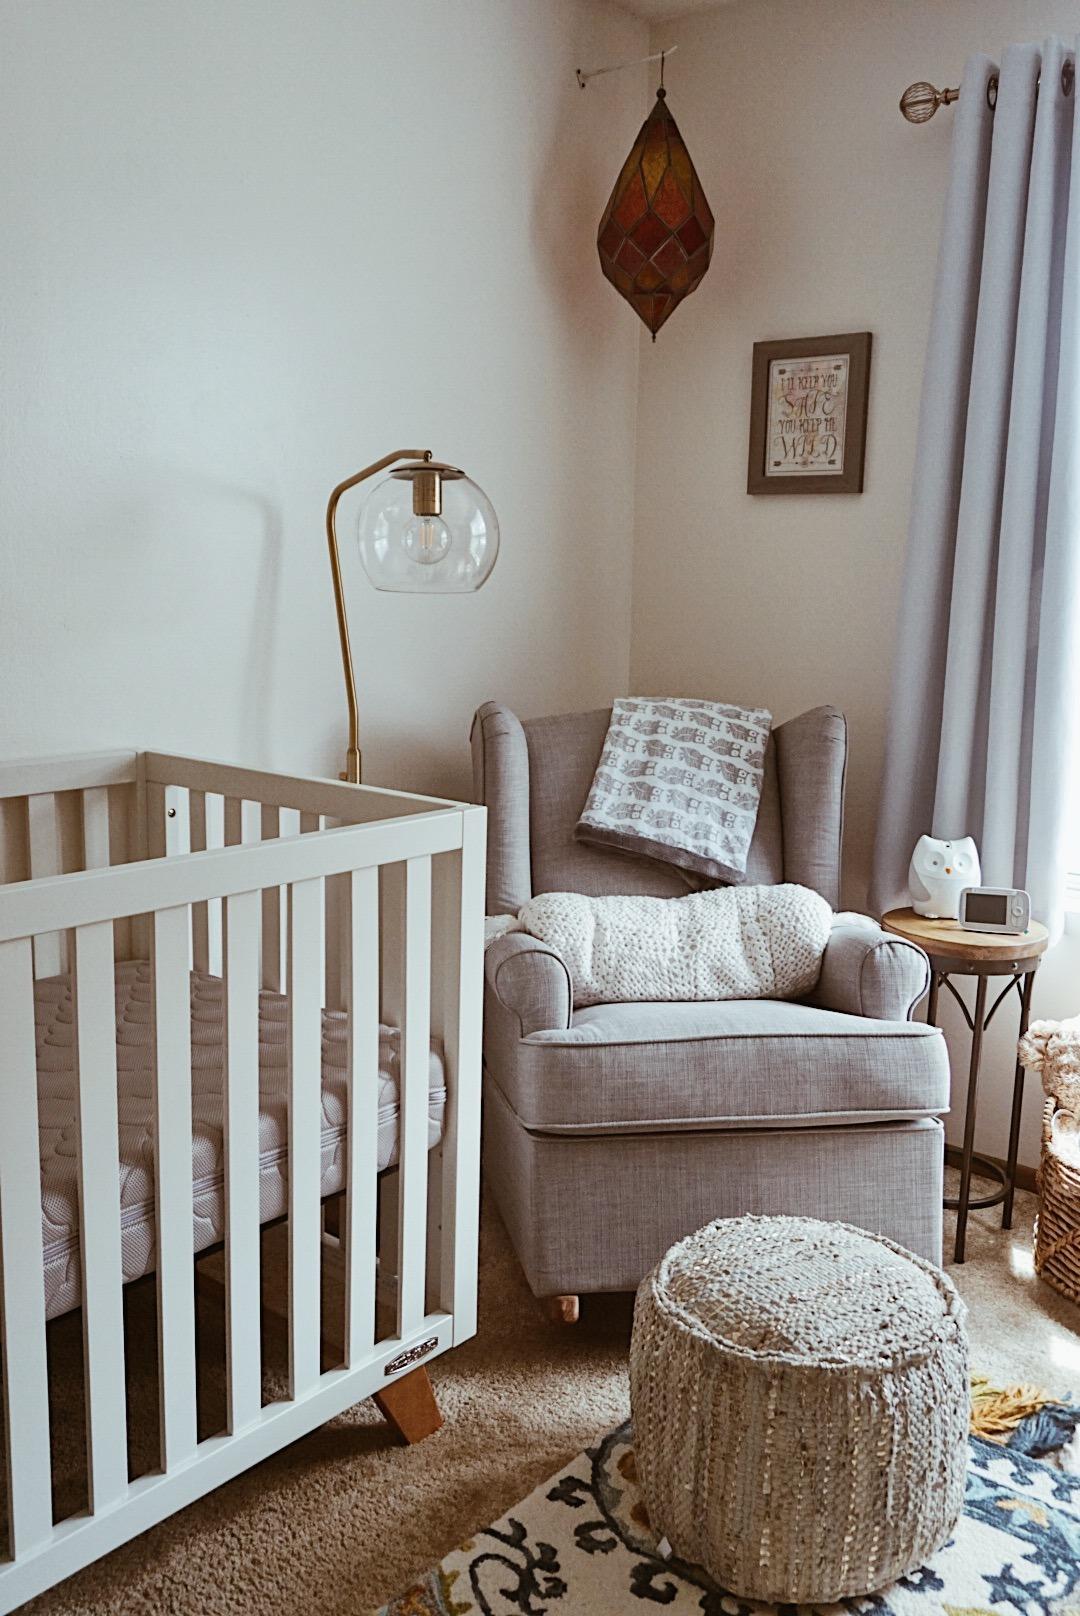 Gender Neutral Baby Nursery | Everyday Mama - Baby O's Nursery Reveal